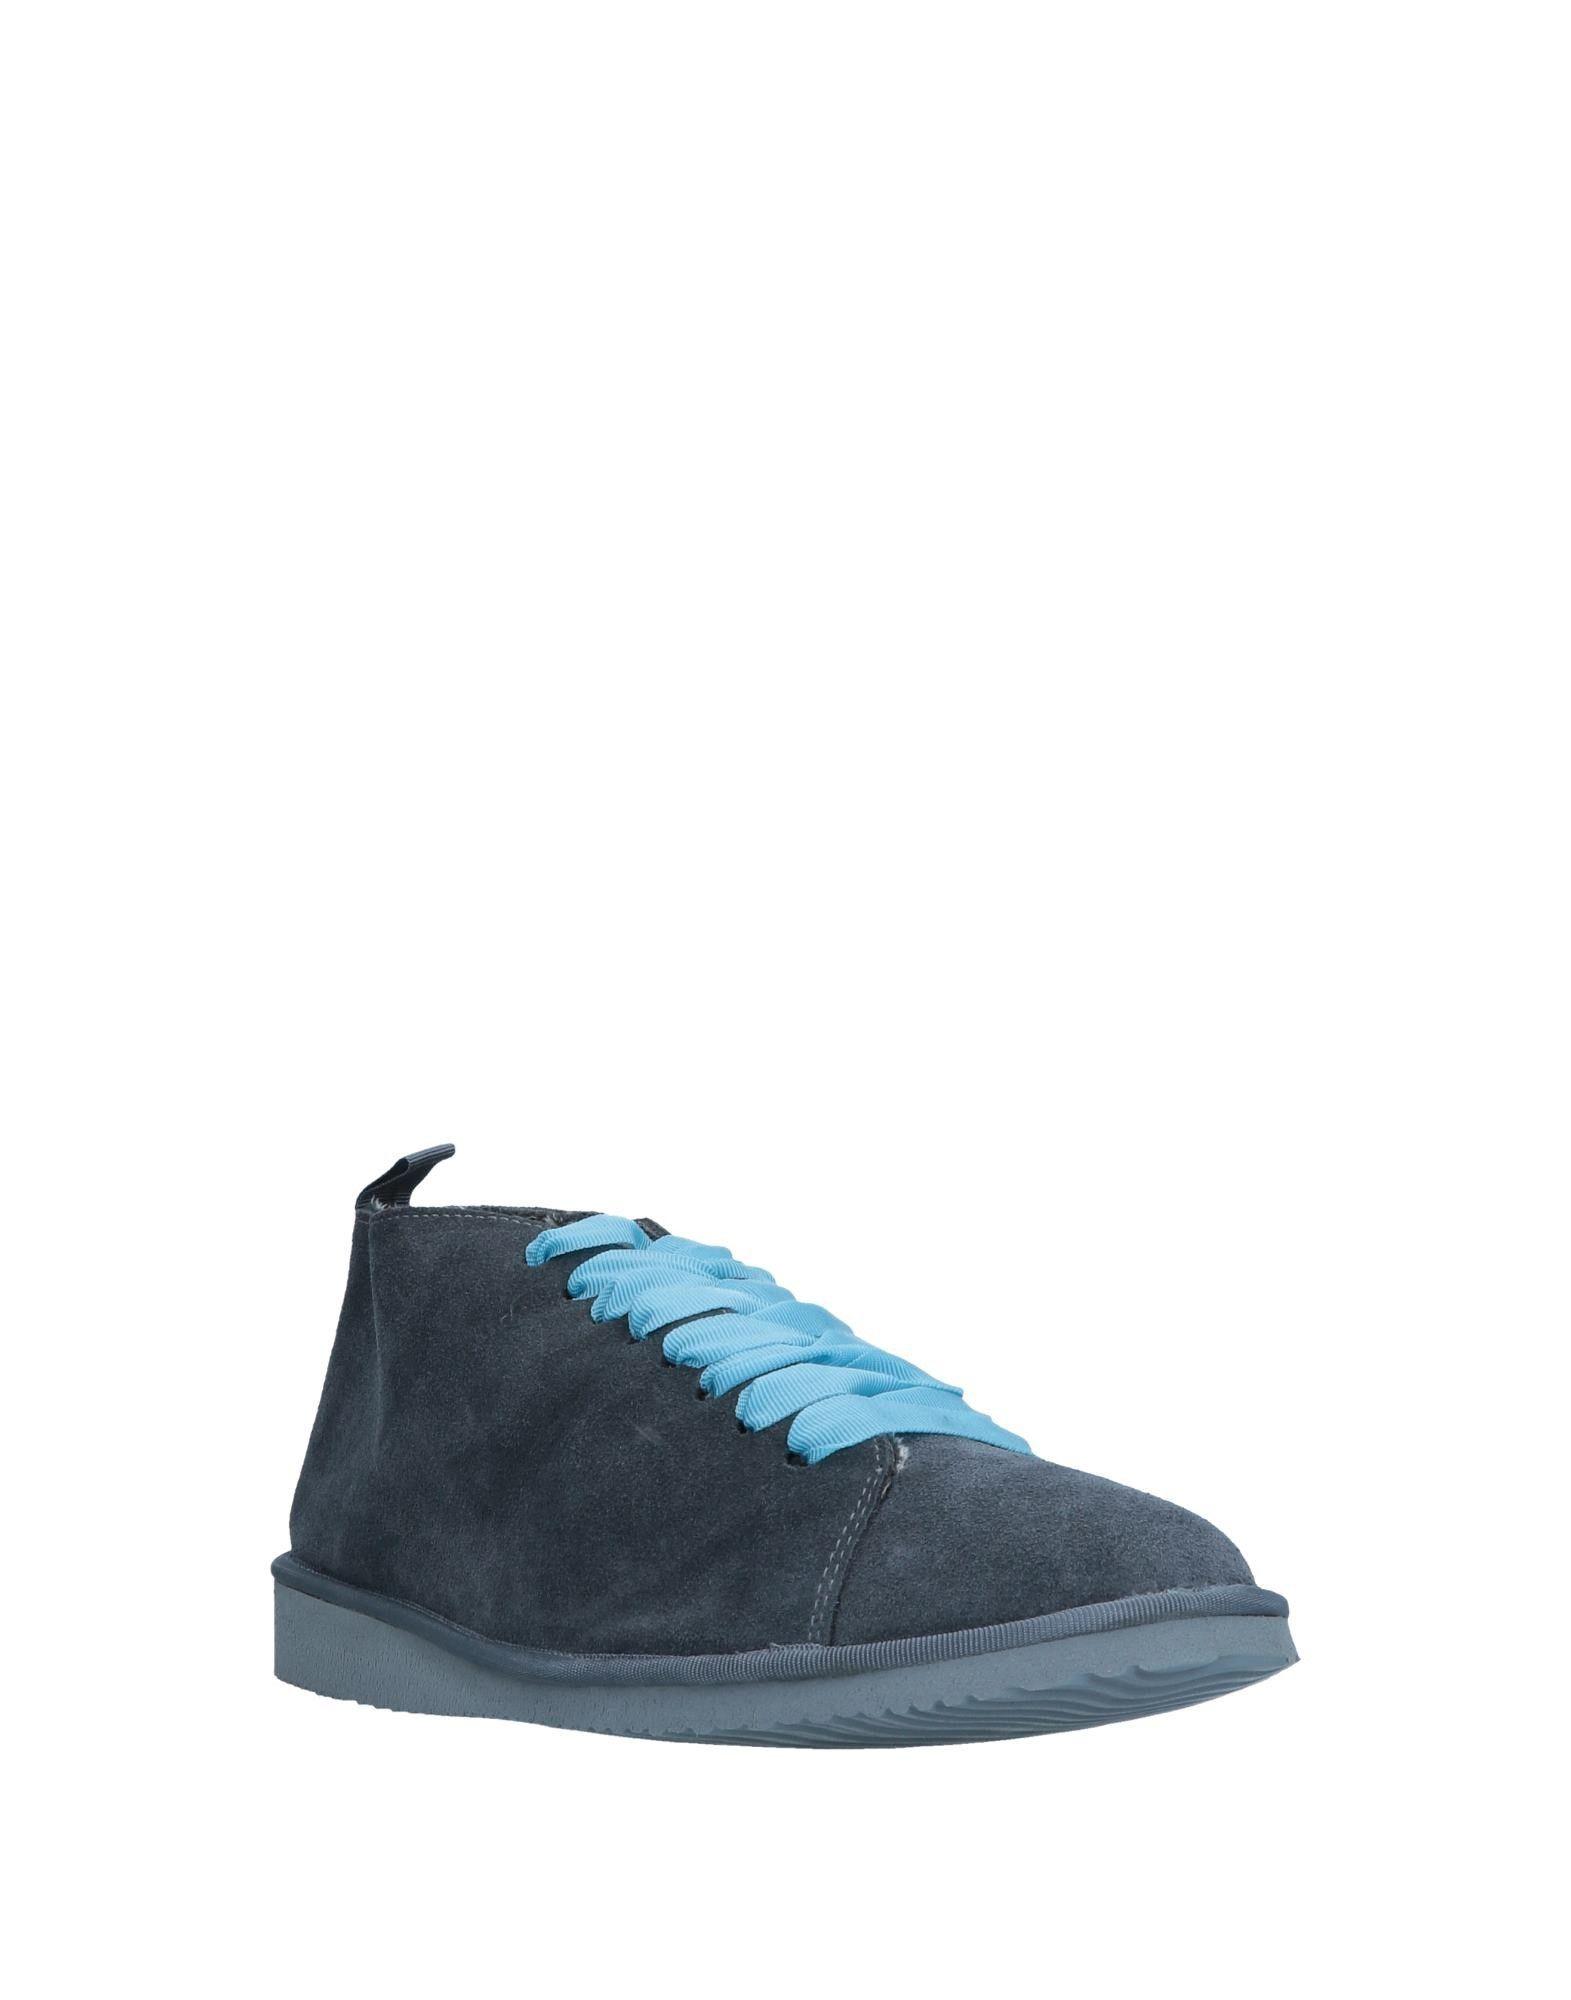 Rabatt echte Schuhe Pànchic Sneakers  Herren  Sneakers 11547953MX 6e564e